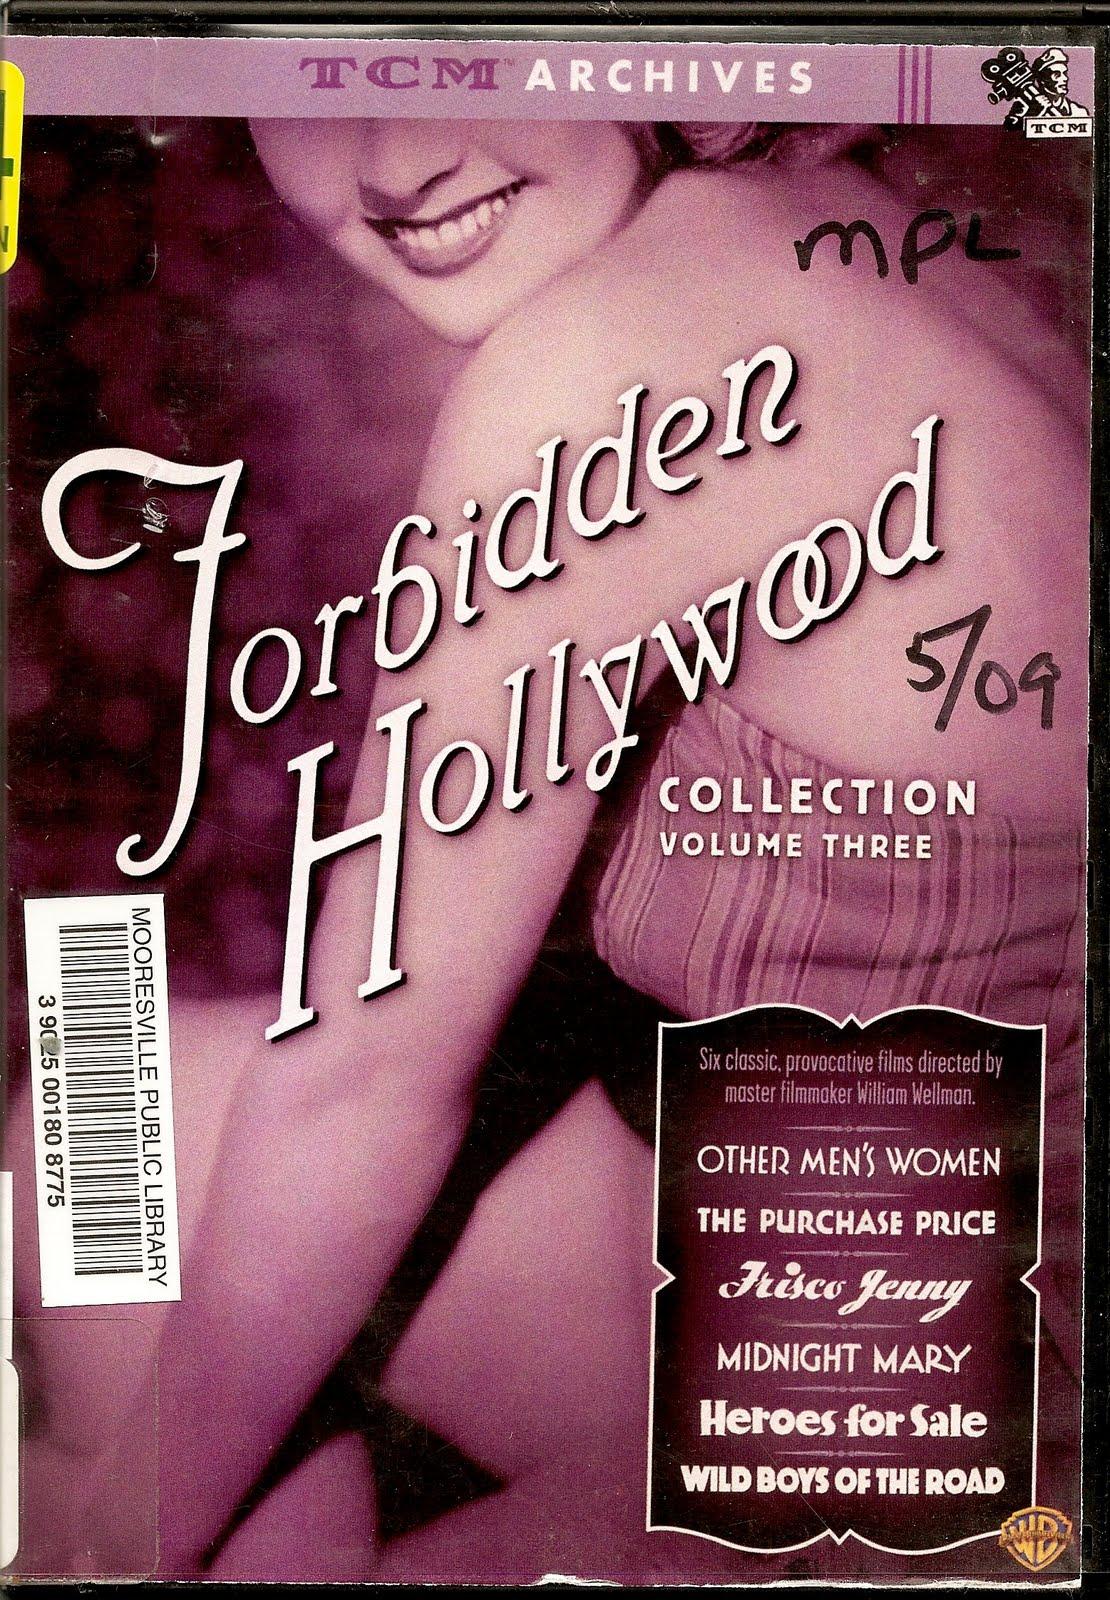 http://3.bp.blogspot.com/_DBRC1JjTZgA/S_noOJTXc9I/AAAAAAAABNg/53jEVBqfL7I/s1600/Rooftop+Forbidden+Hollywood.jpg